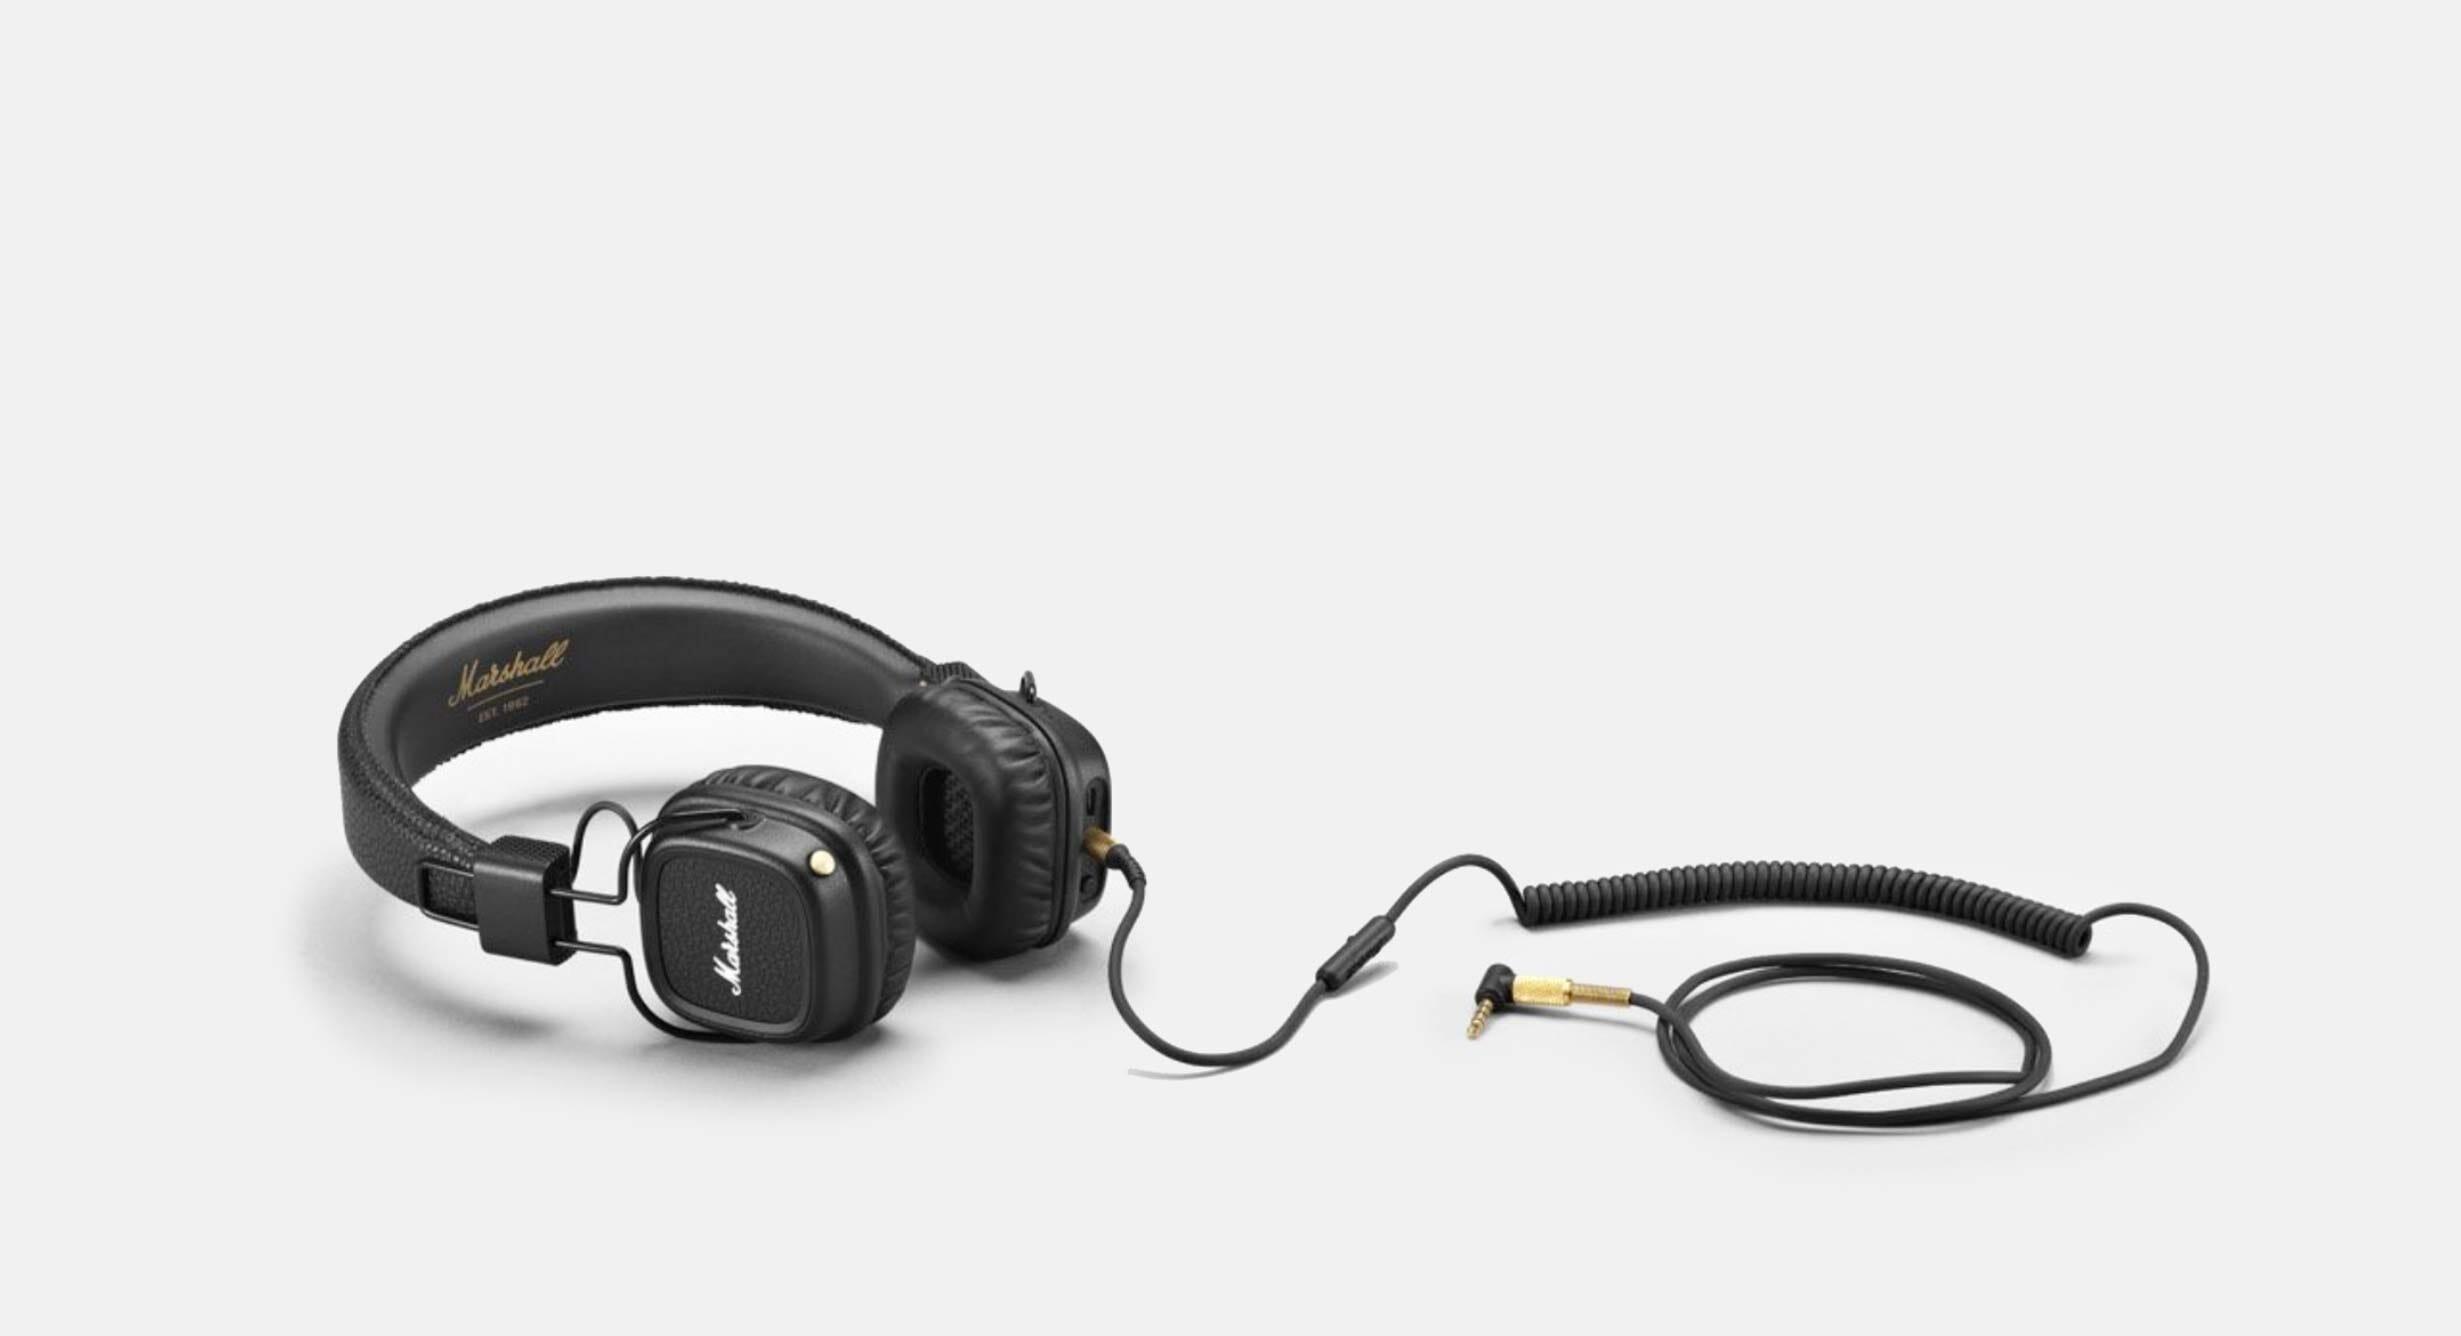 Marshall Major II Headphones Review